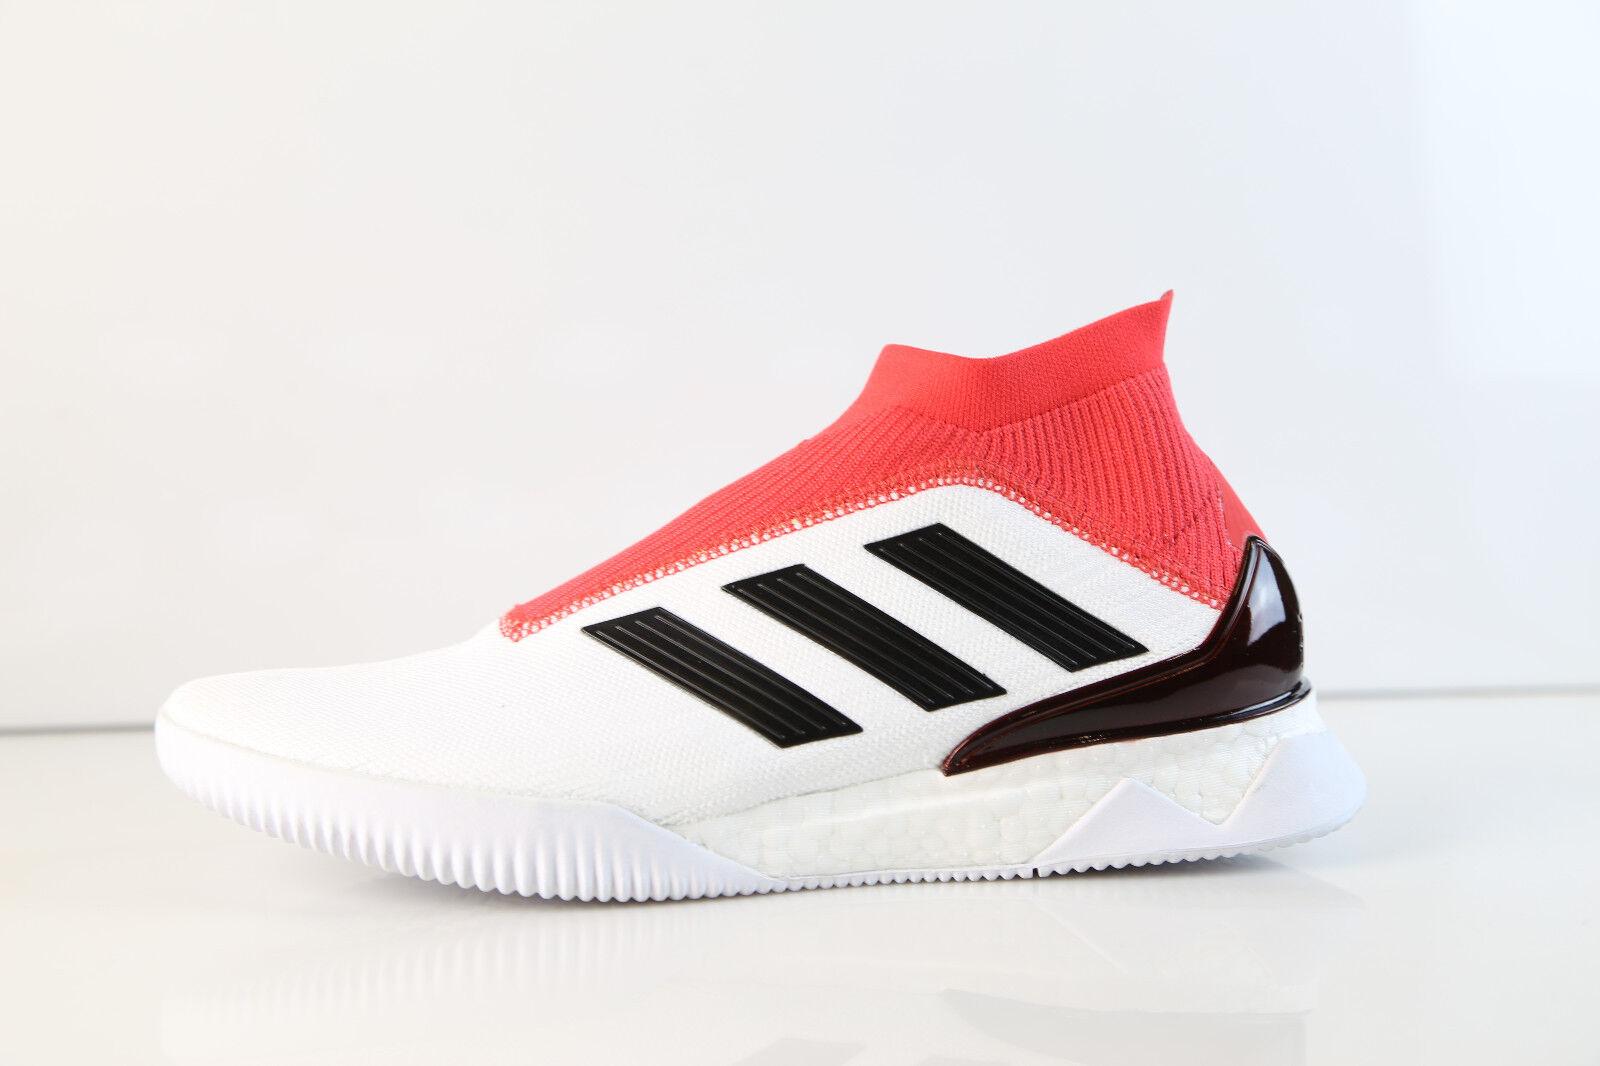 Adidas Predator Tango 18 + TR bianca Rosso Rosso Rosso Coral CM7686 8-12 boost ultra ec4f30